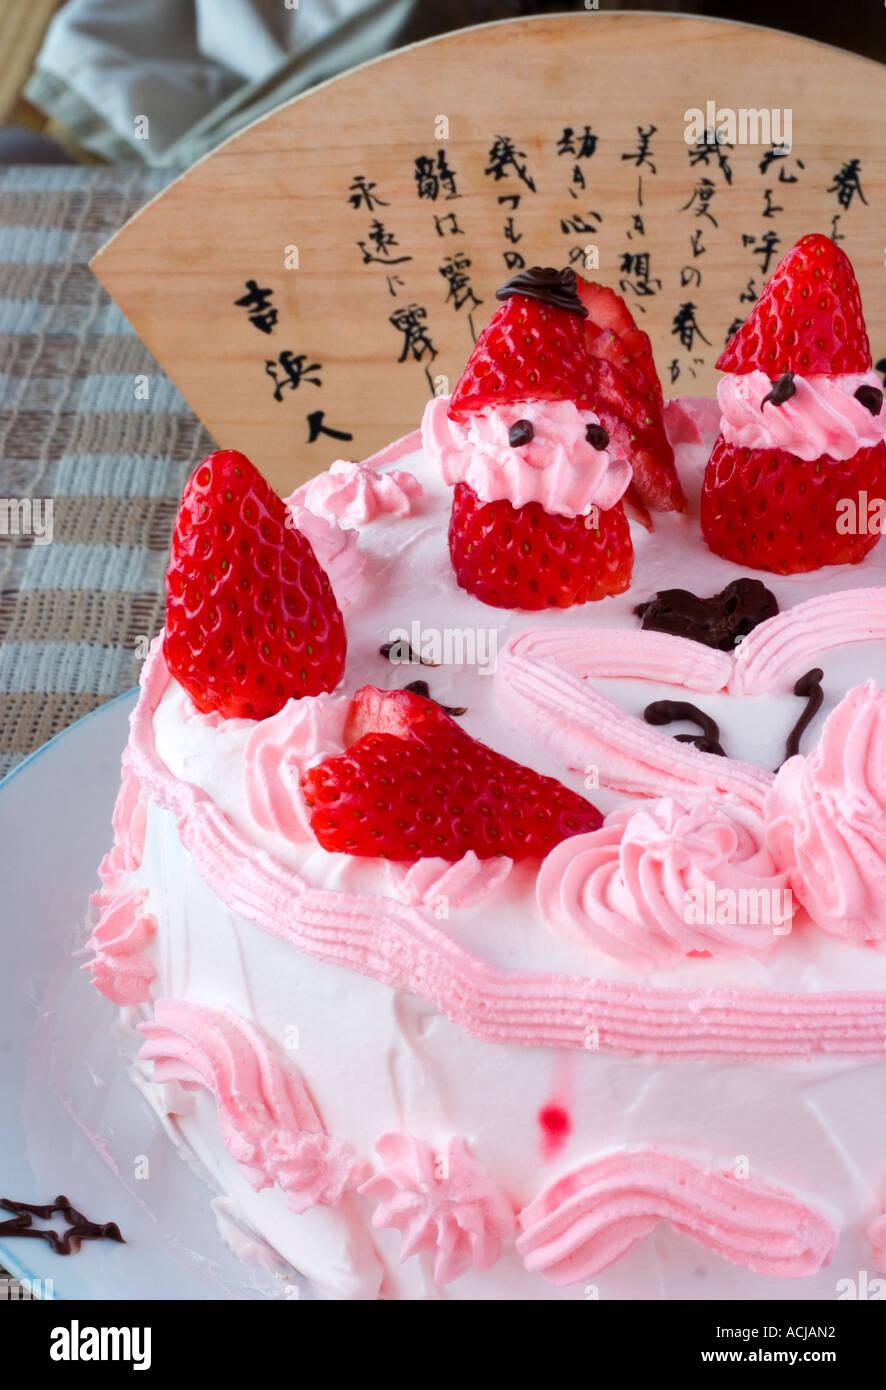 Japanese Man Cake Stock Photos Japanese Man Cake Stock Images Alamy